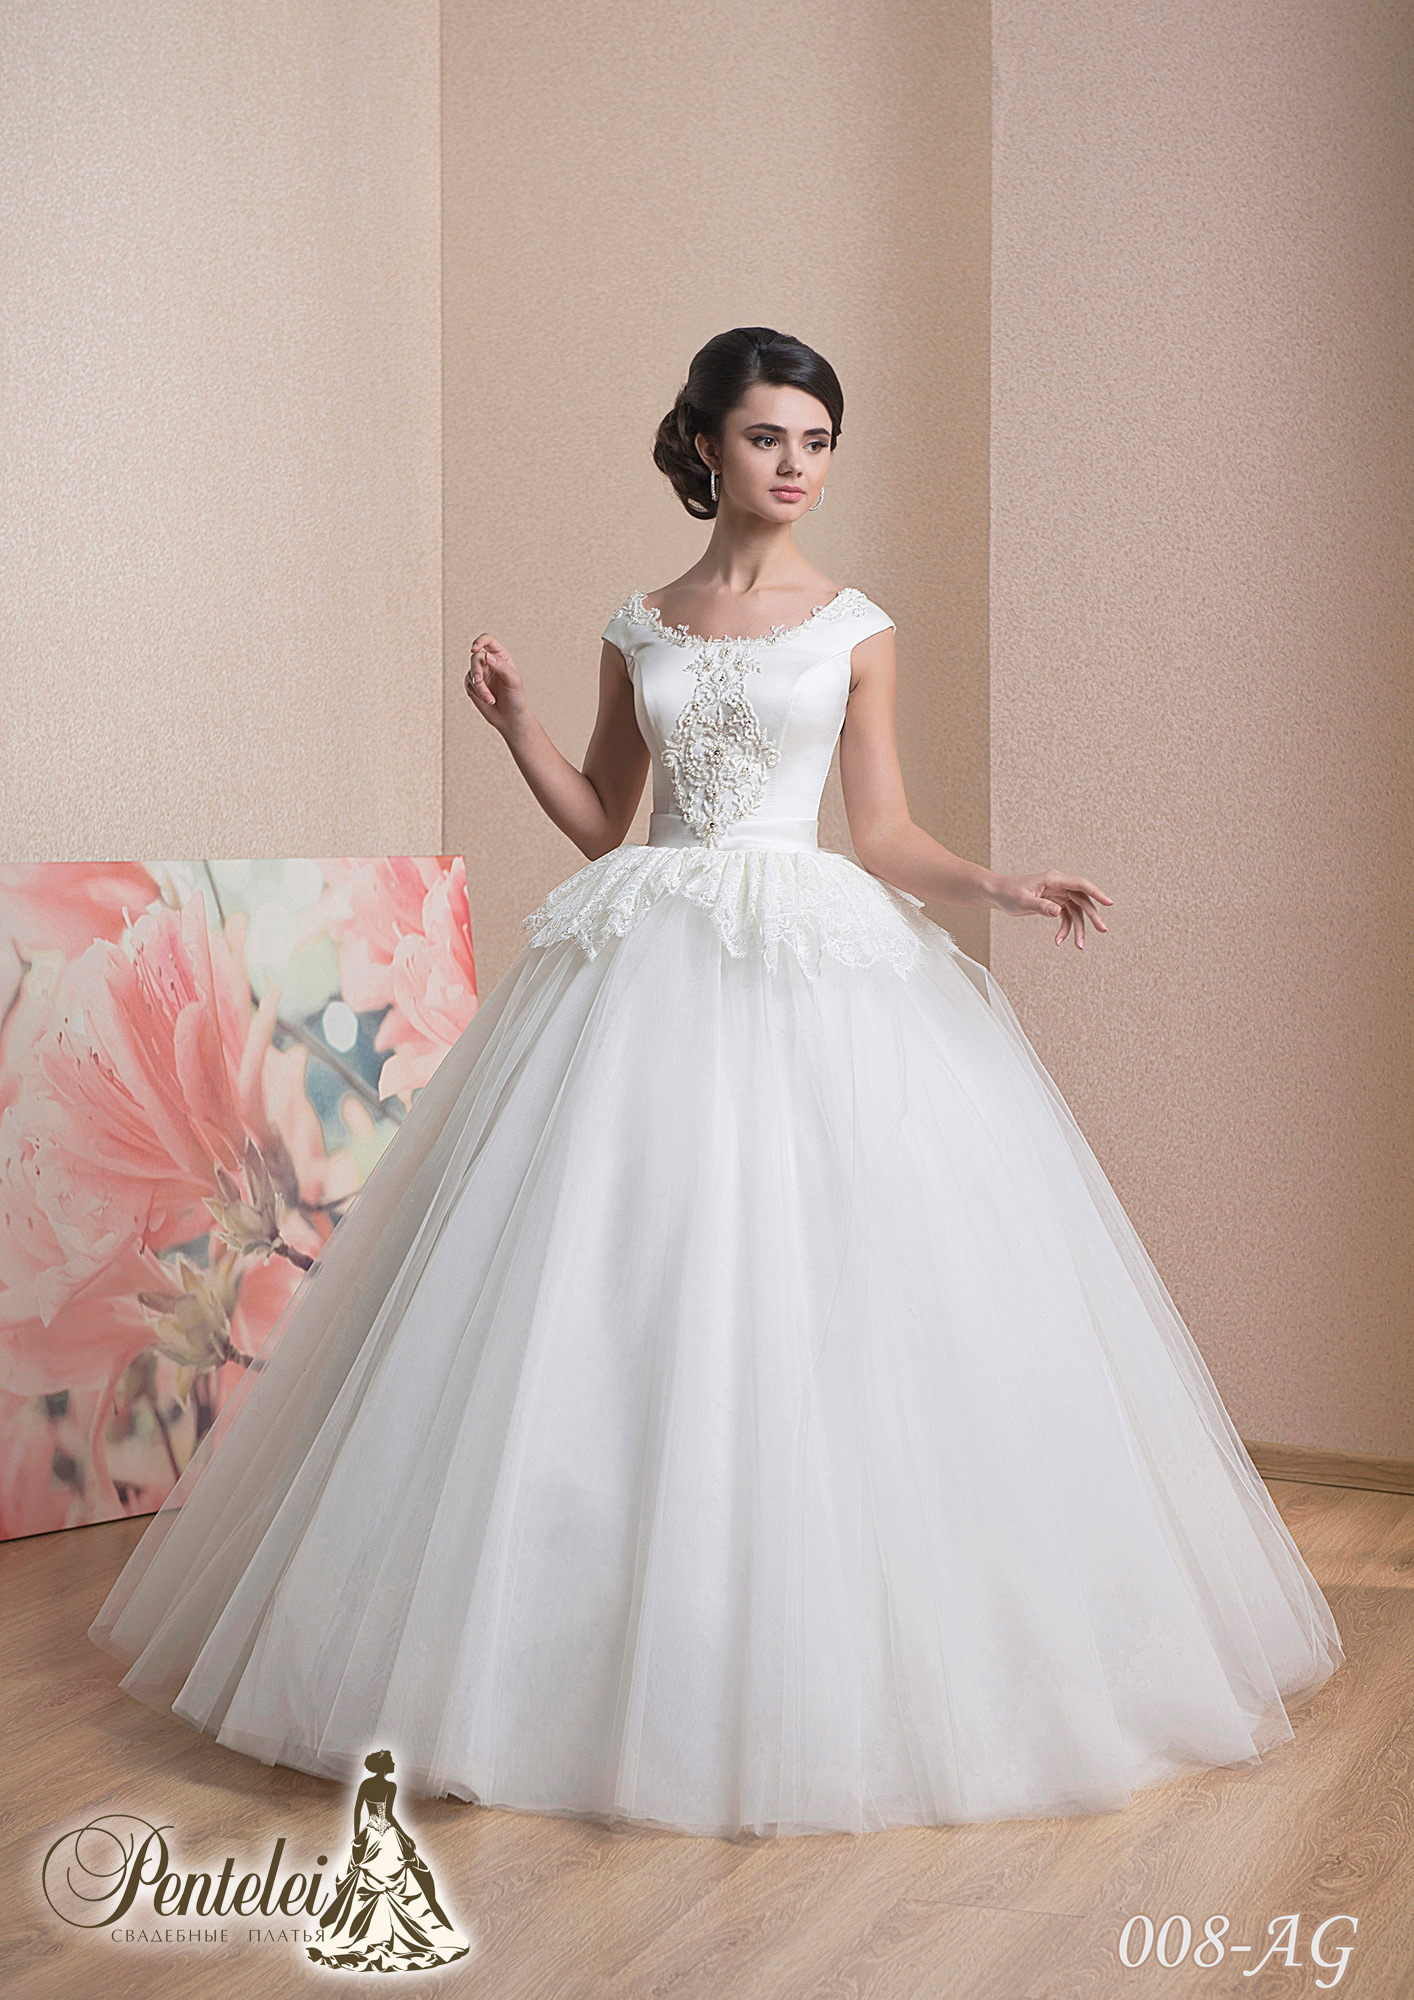 008-AG | Cumpăra rochii de mireasă en-gros de Pentelei